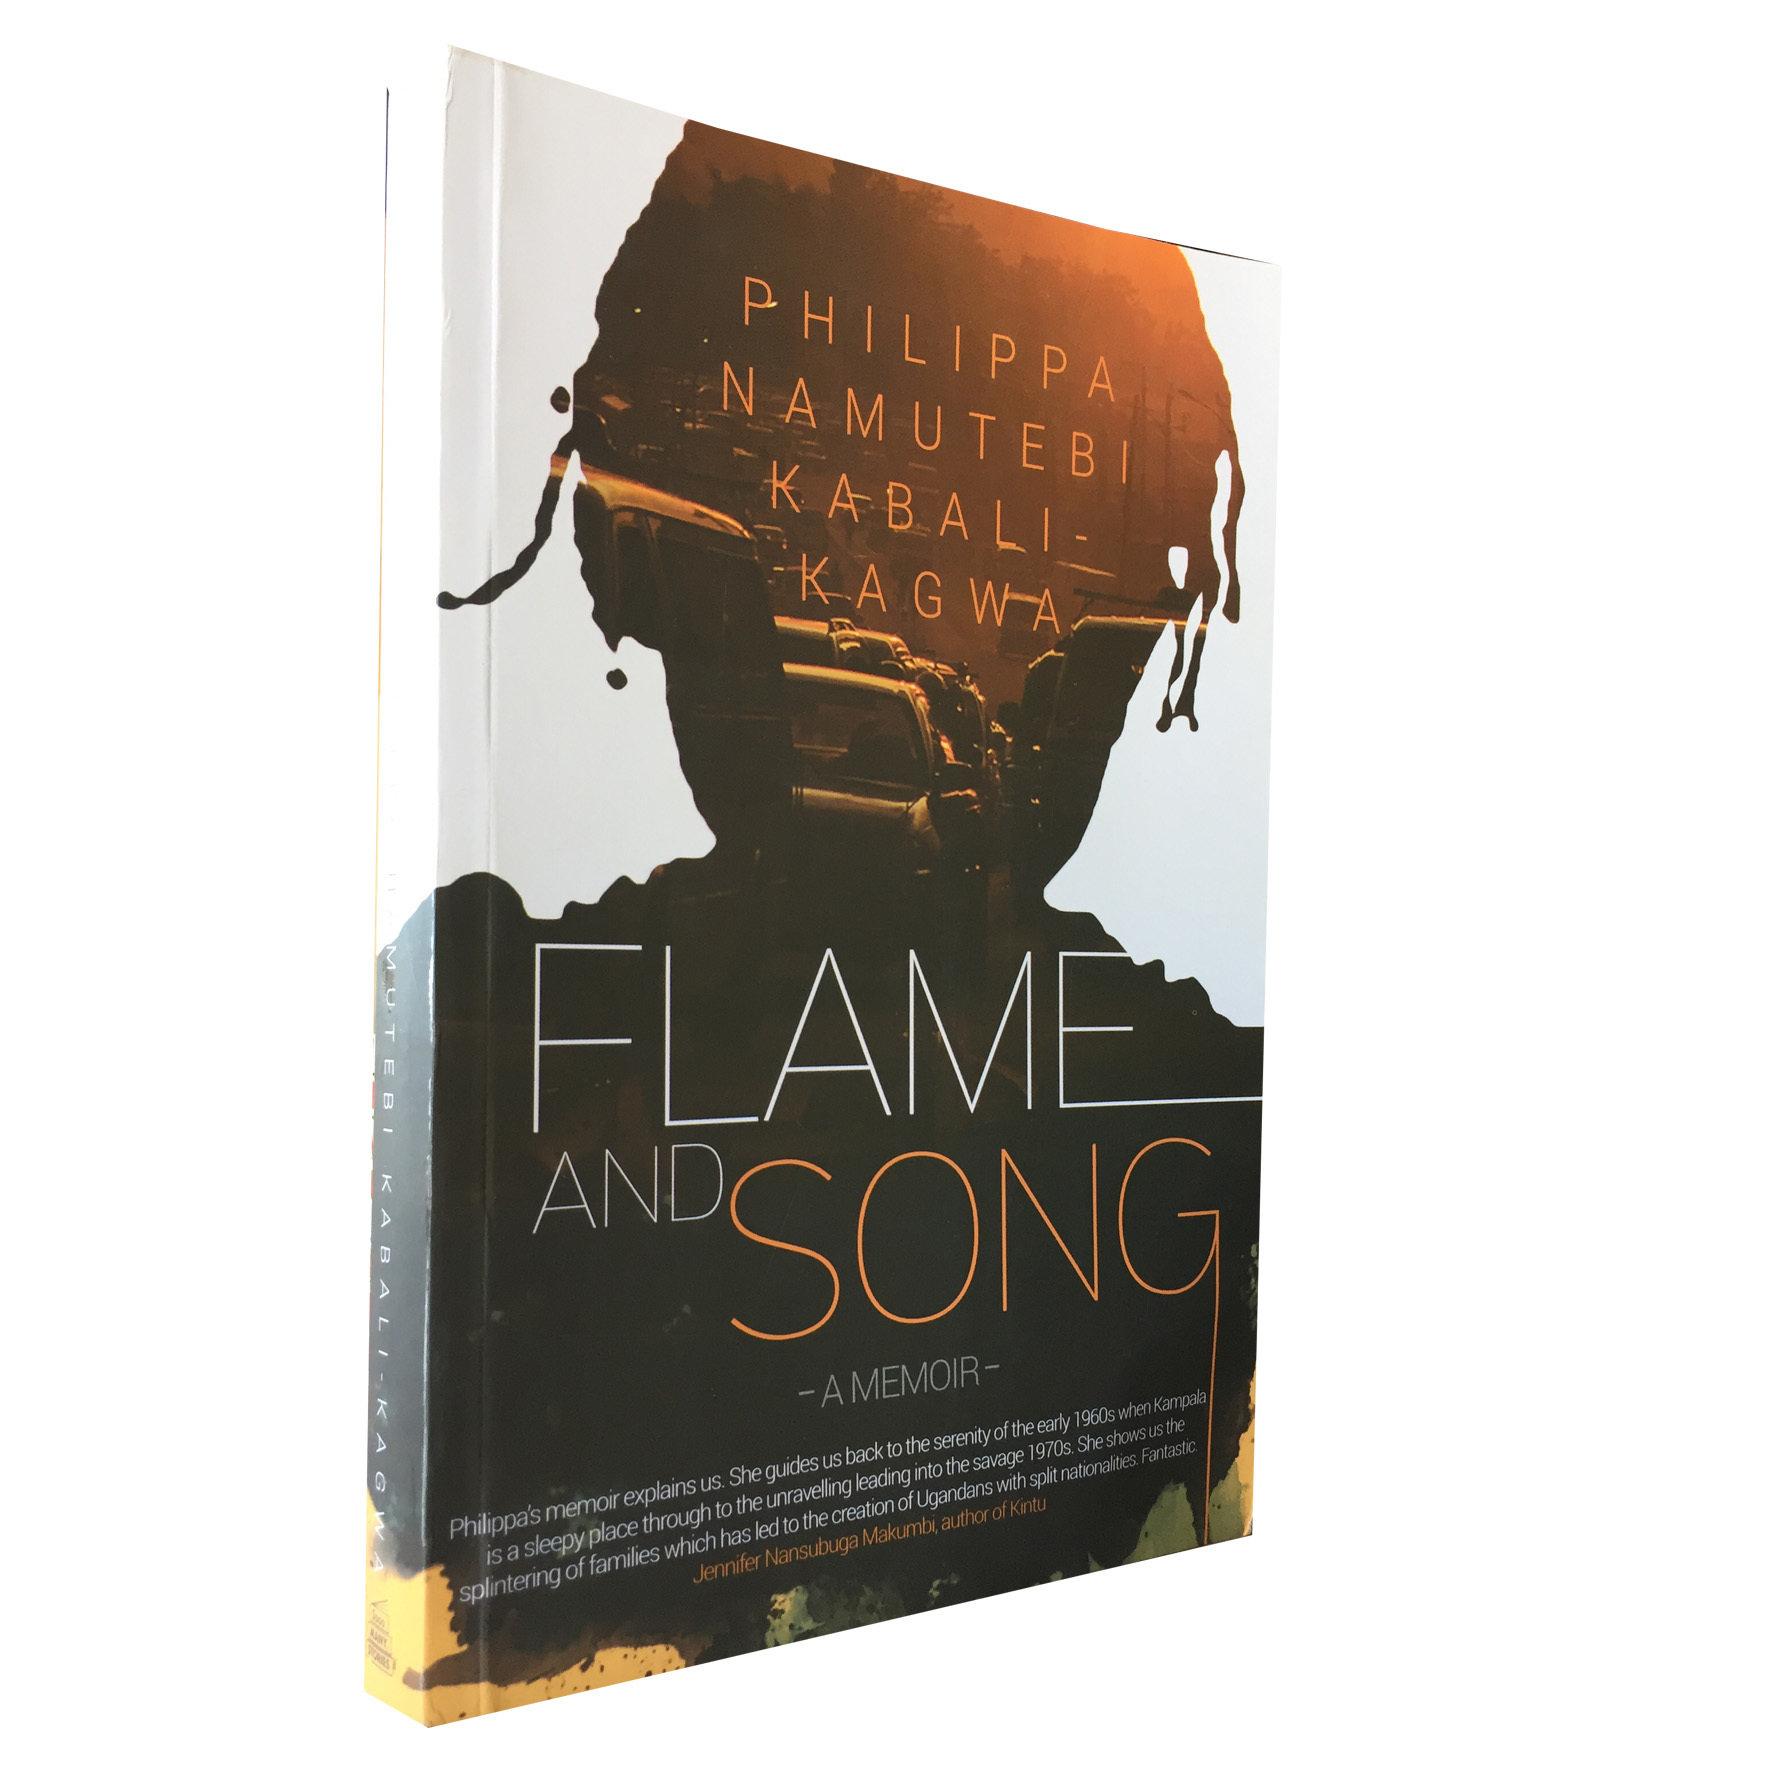 Flame and Song by Philippa Namutebi Kabali-Kagwa (Sooo Many Stories/Modjaji 2017) SM01